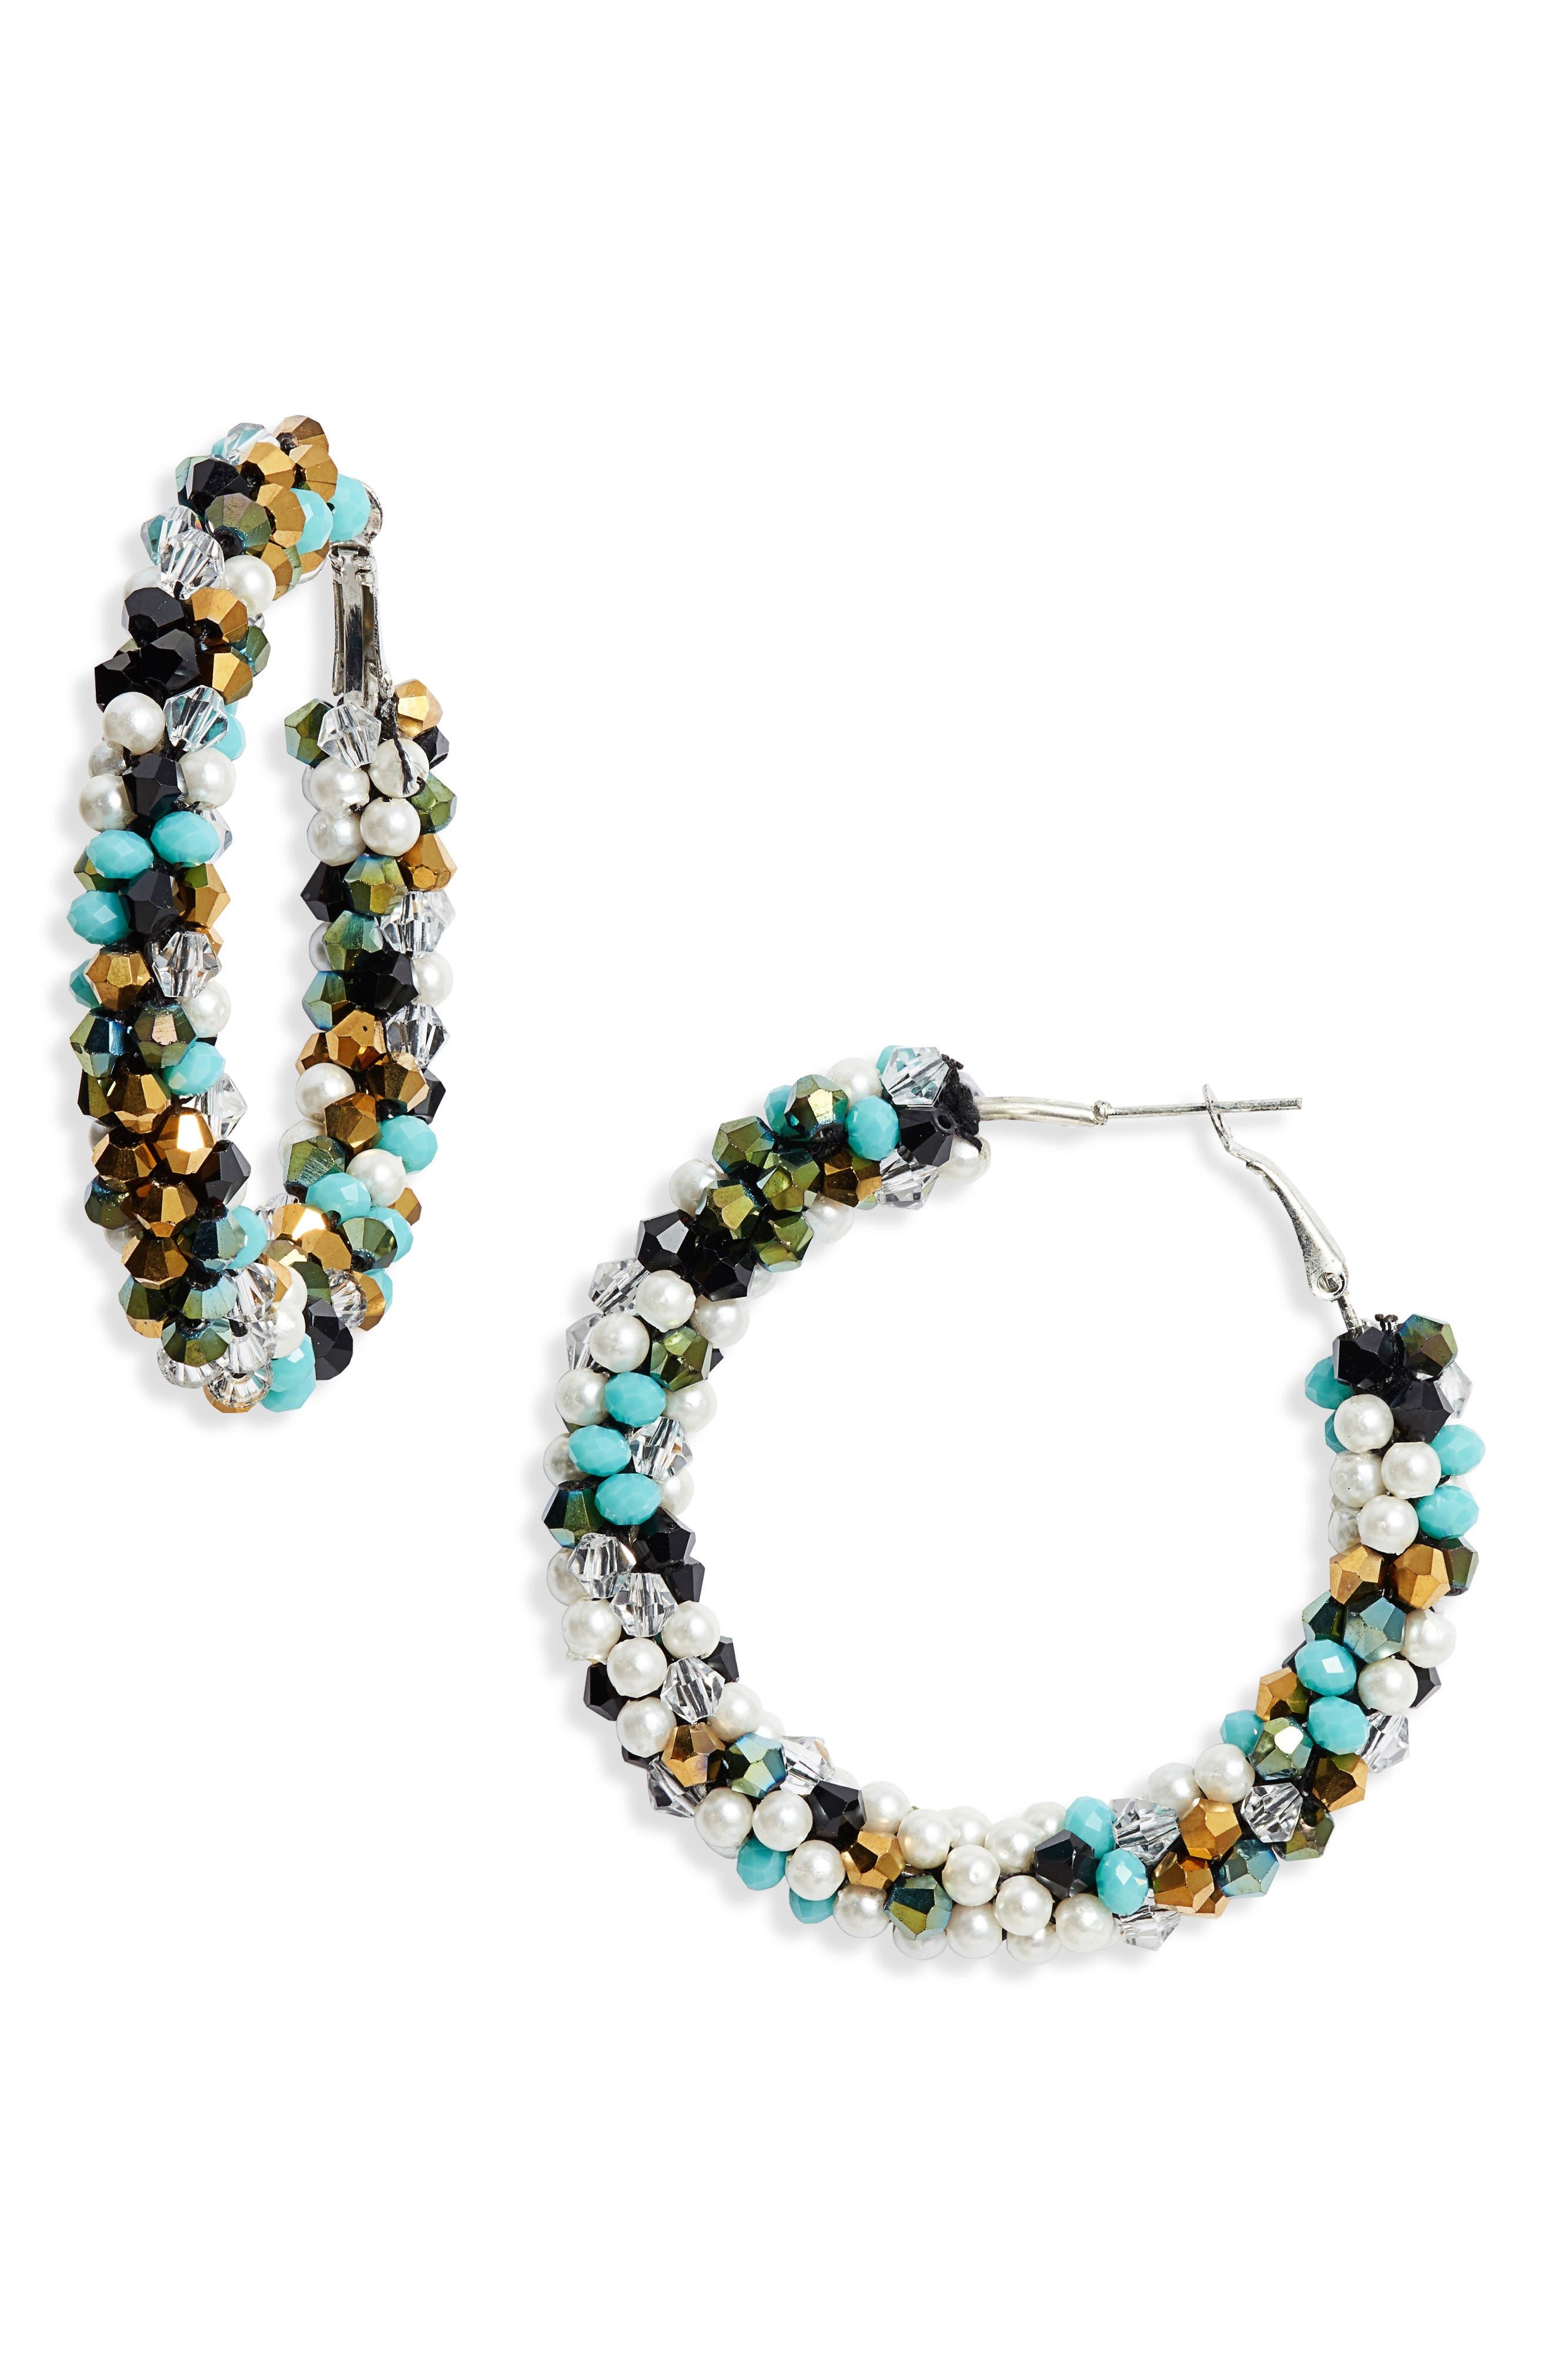 AREA STARS Beaded Hoop Earrings in Blue/ Multi